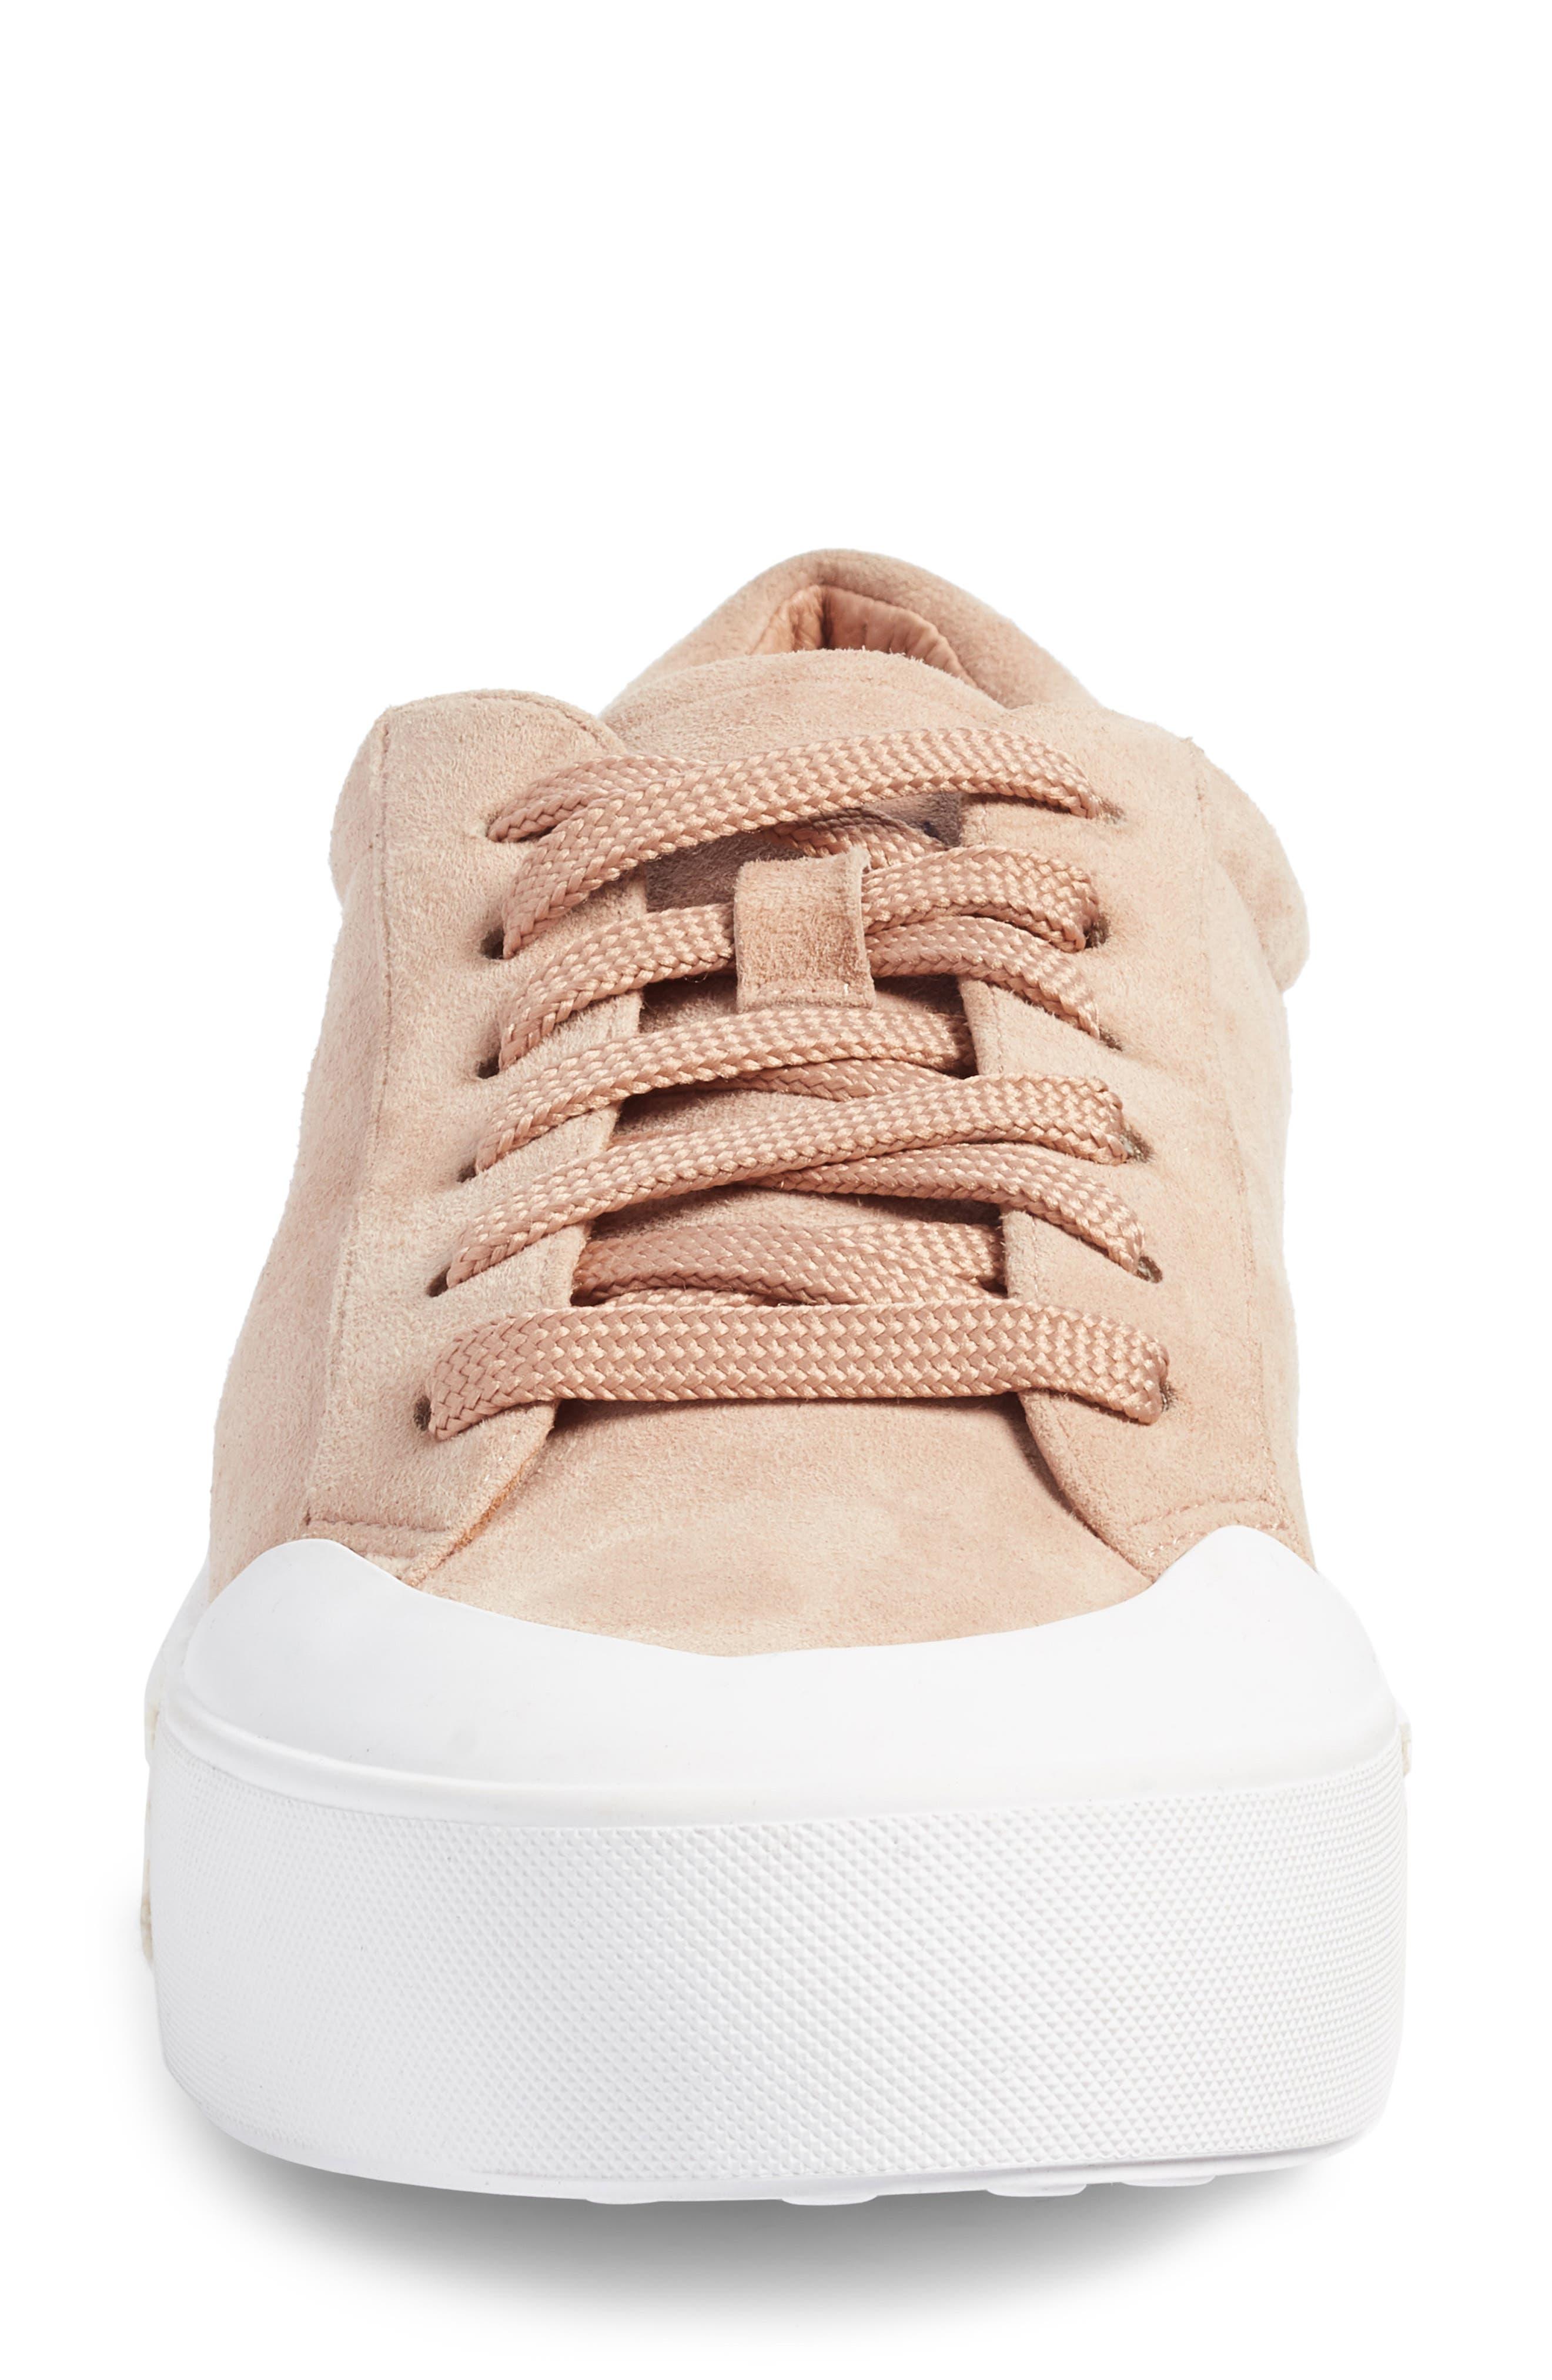 Toran Platform Sneaker,                             Alternate thumbnail 4, color,                             Blush Suede